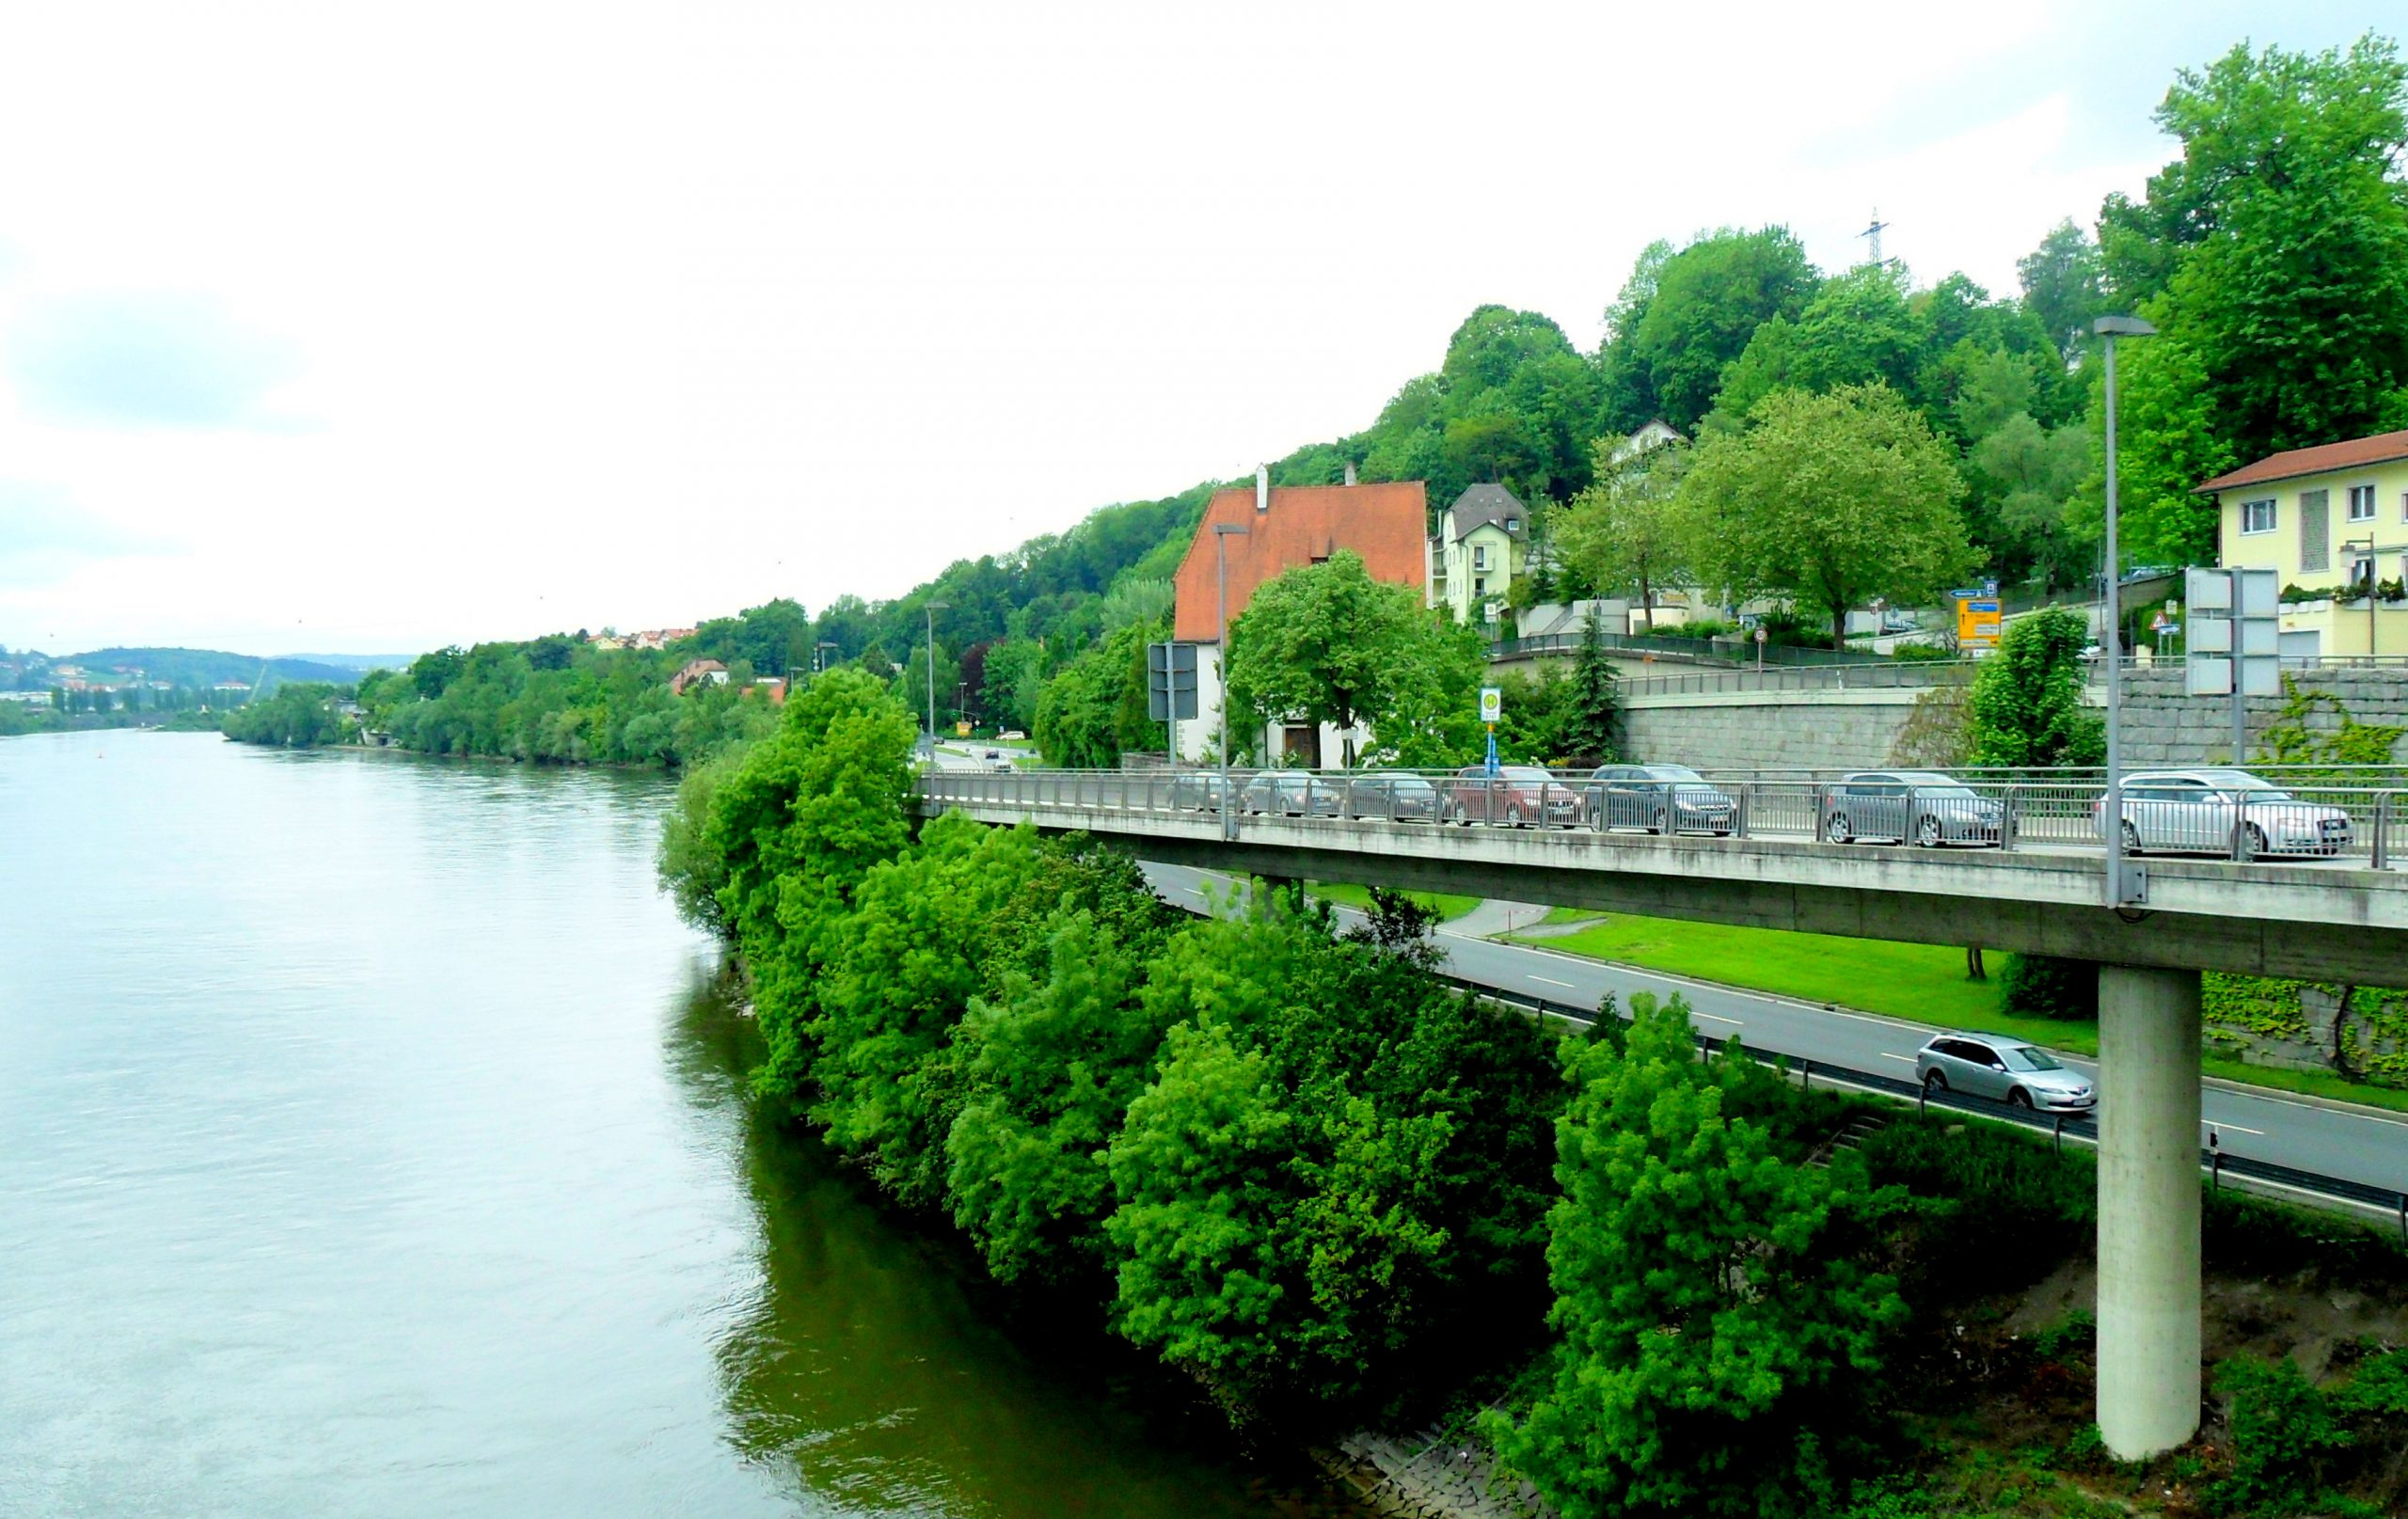 A bridge along a river